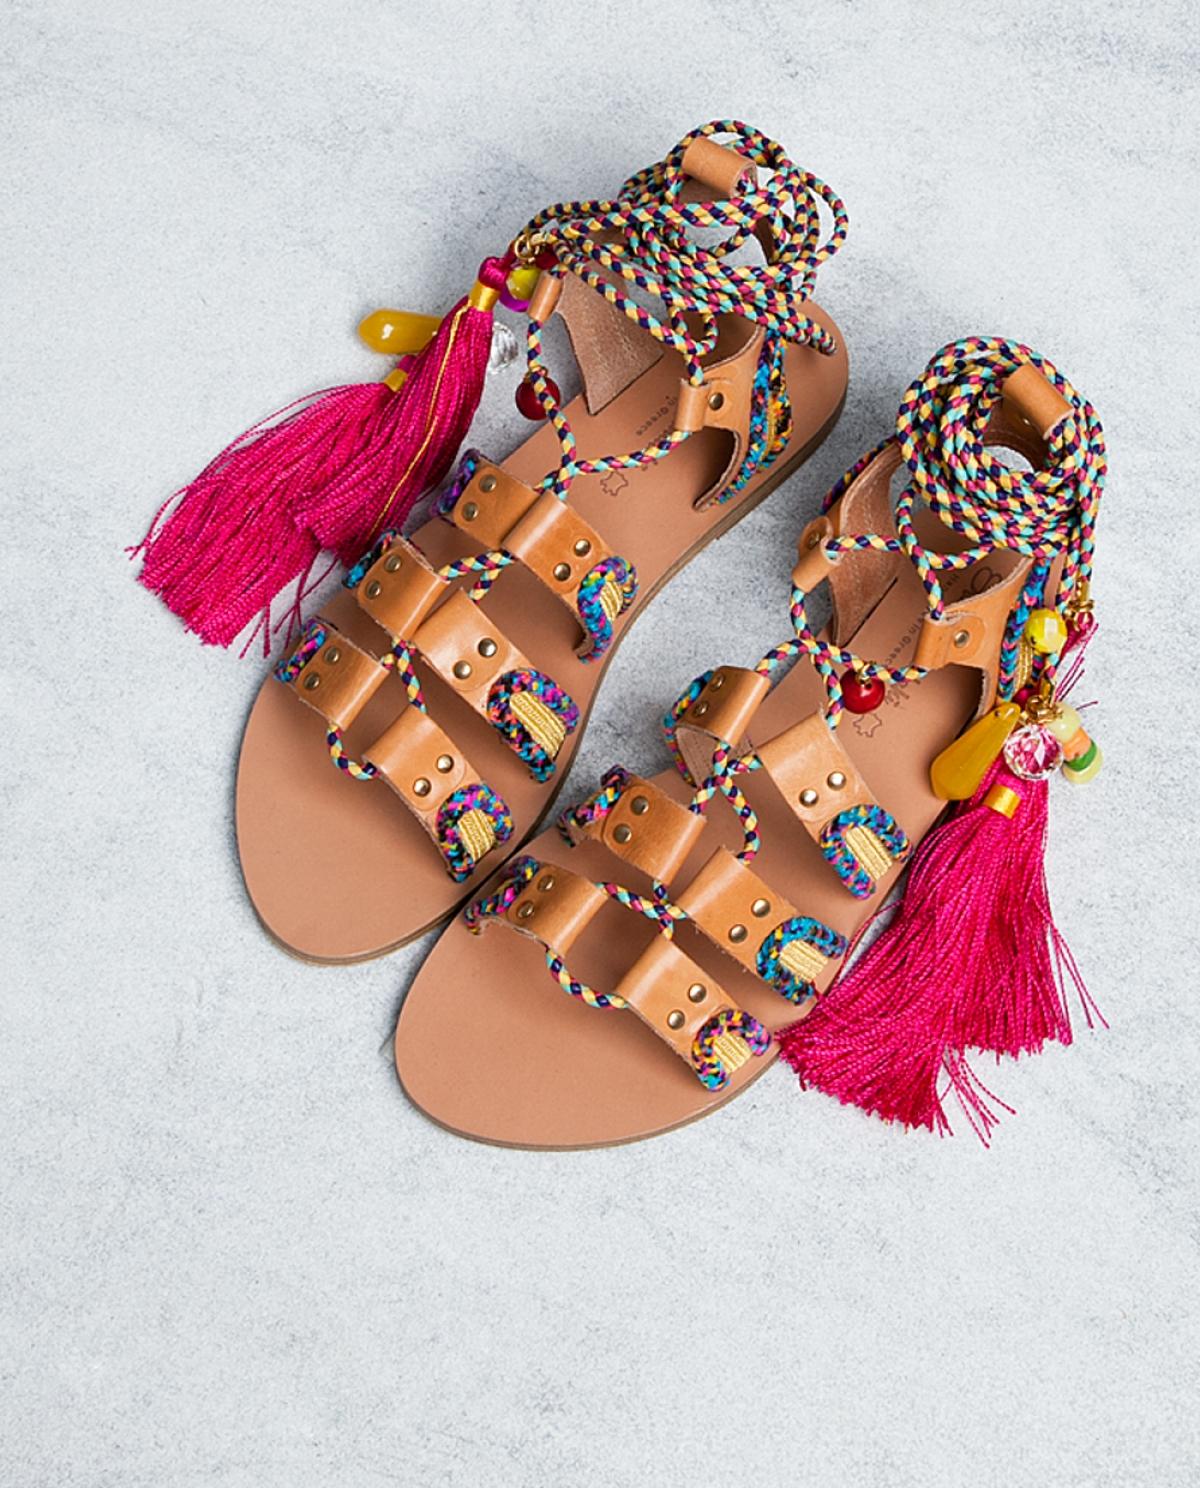 d2859f66d Pisces Embellished Leather Sandals - Fashionnoiz